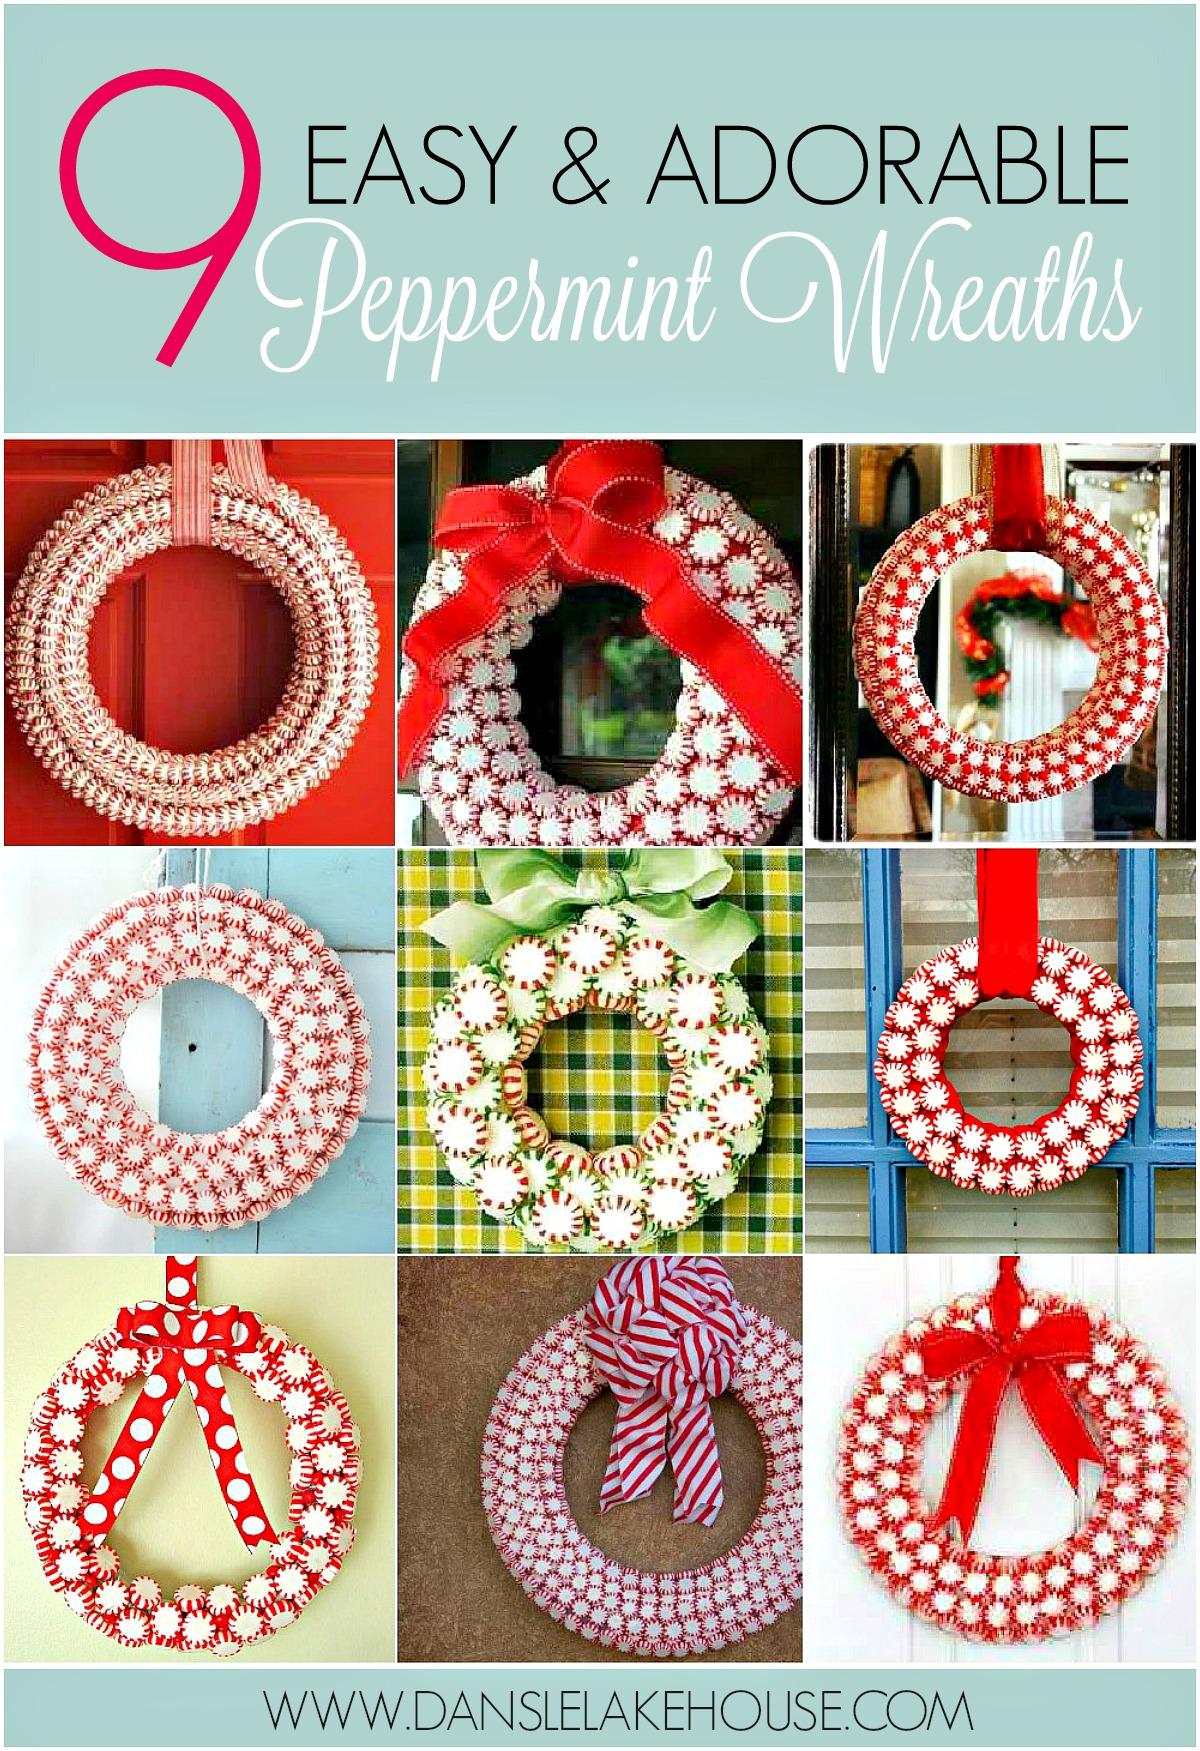 9 Peppermint Wreath Ideas